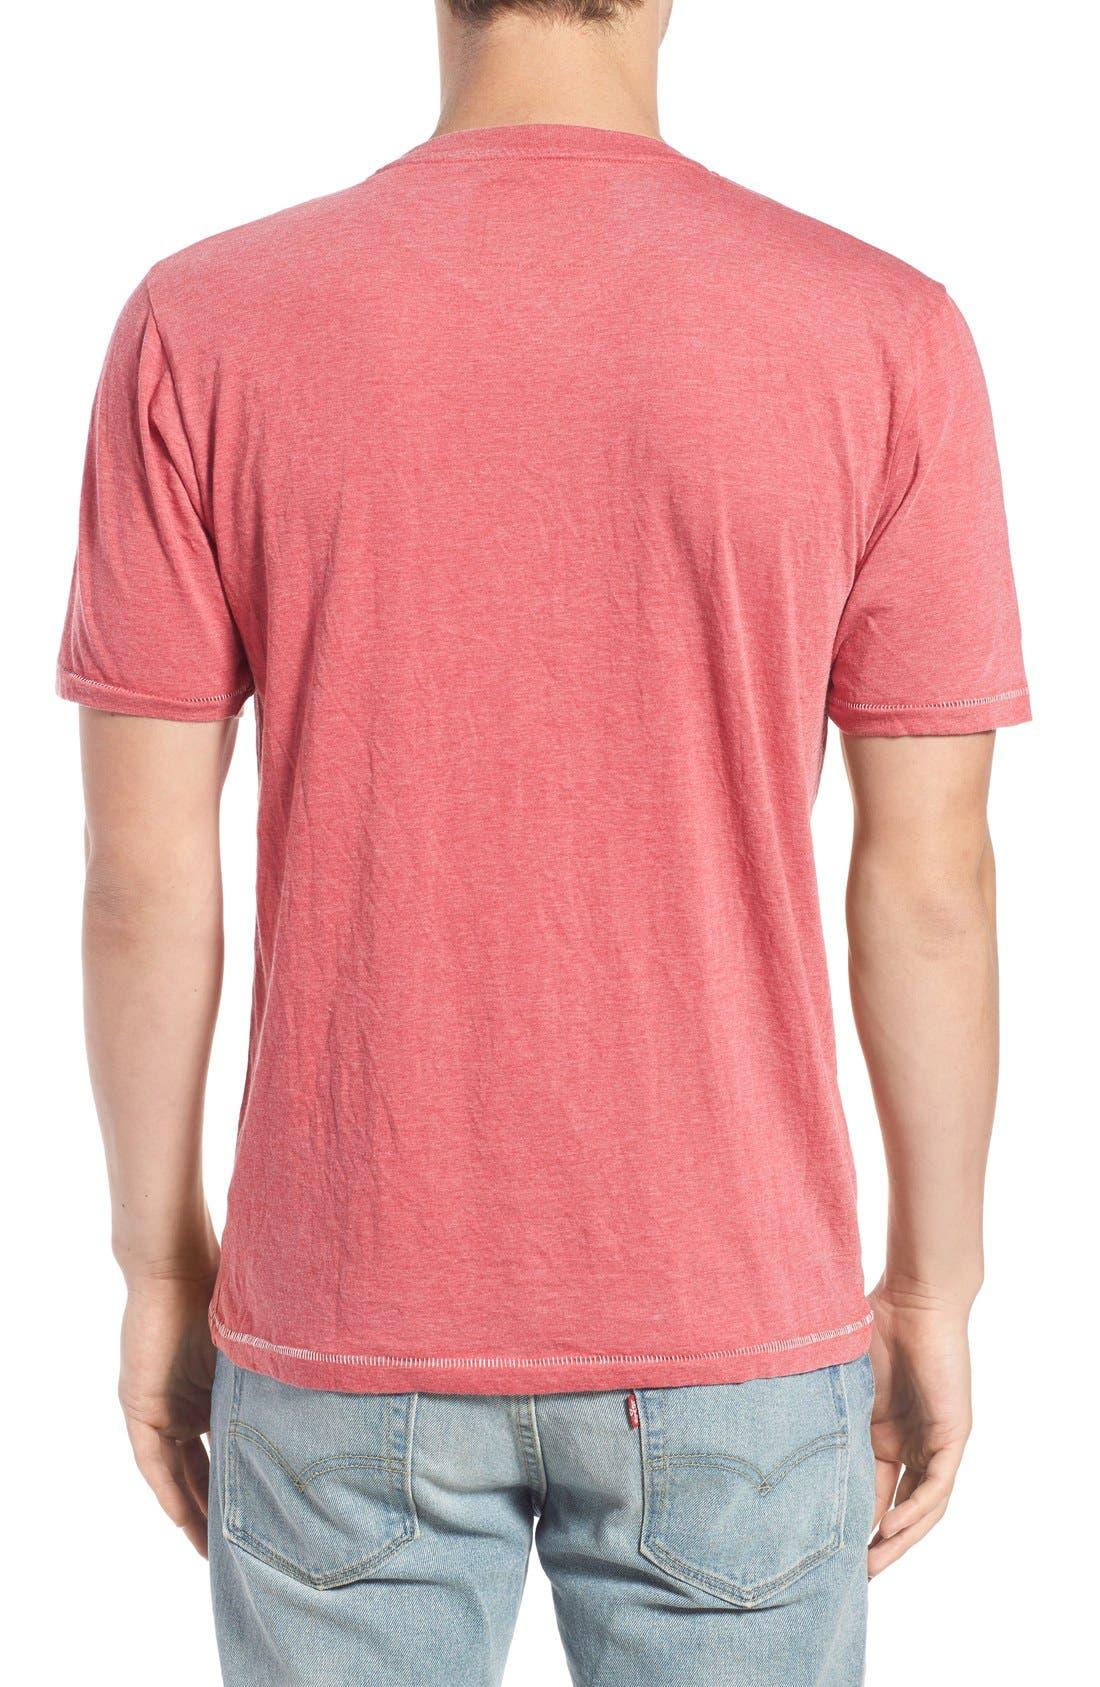 'California Angels' Graphic V-Neck T-Shirt,                             Alternate thumbnail 2, color,                             600